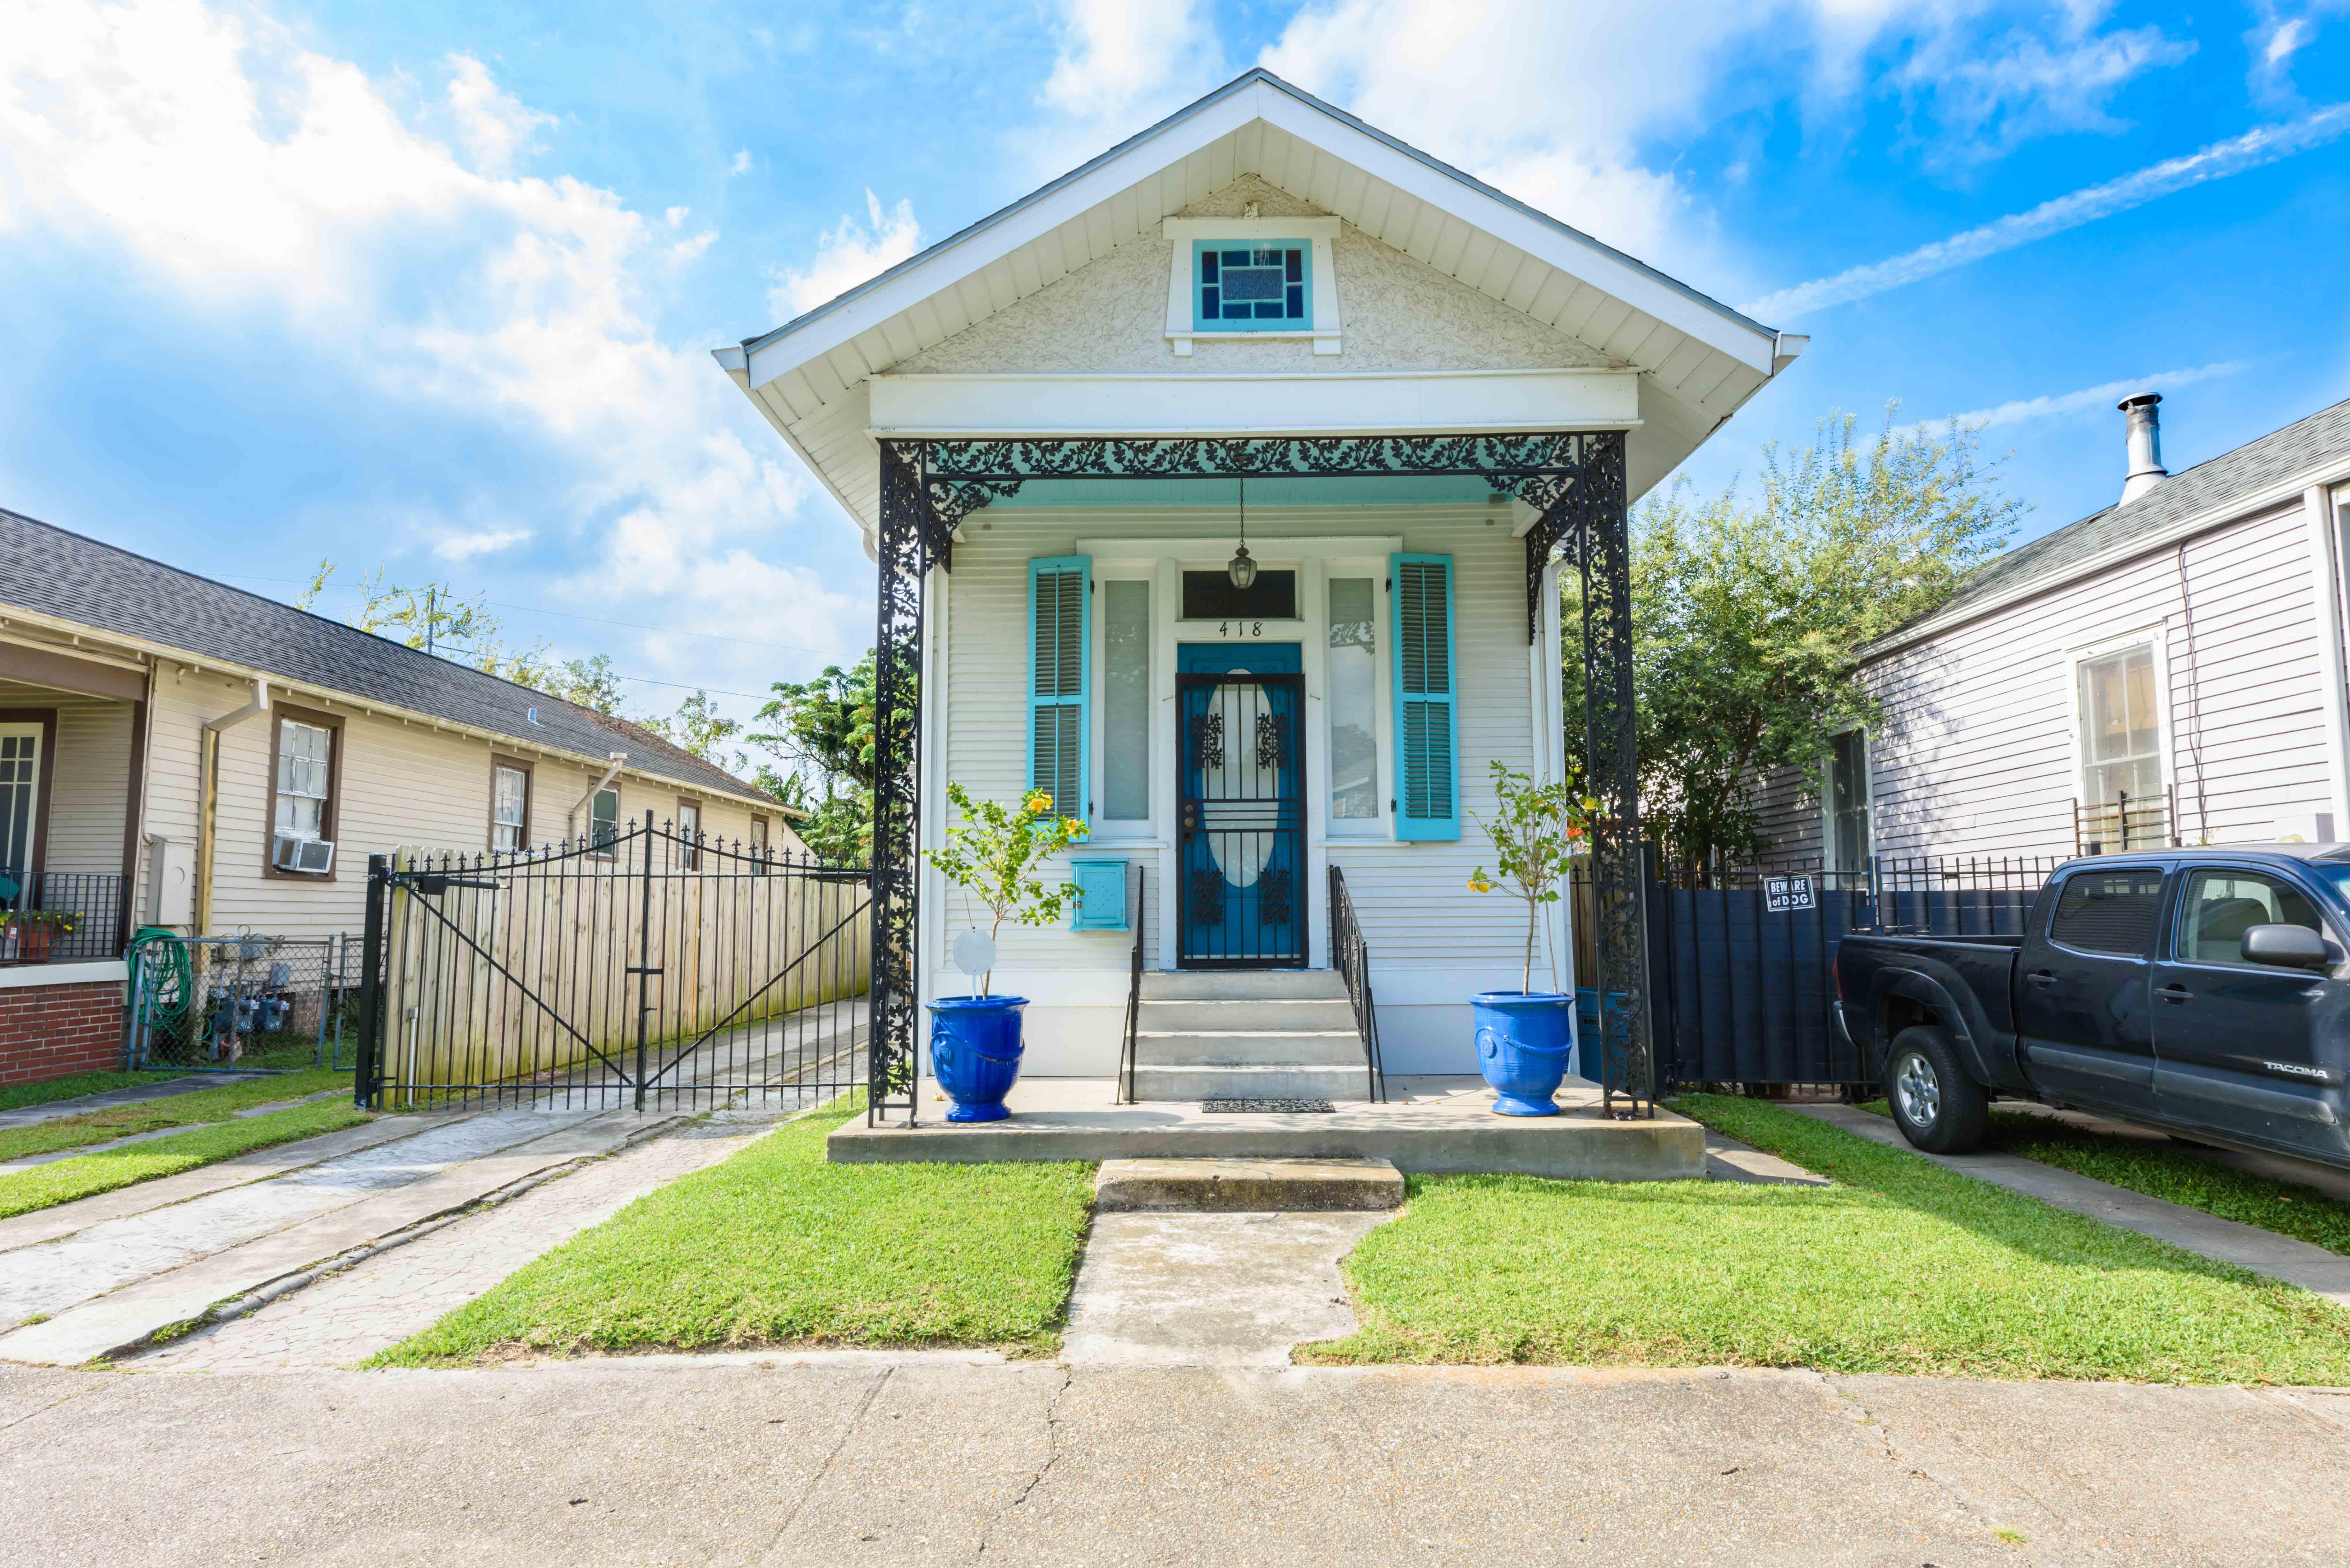 418 Monticello Street in Jefferson, Louisiana.